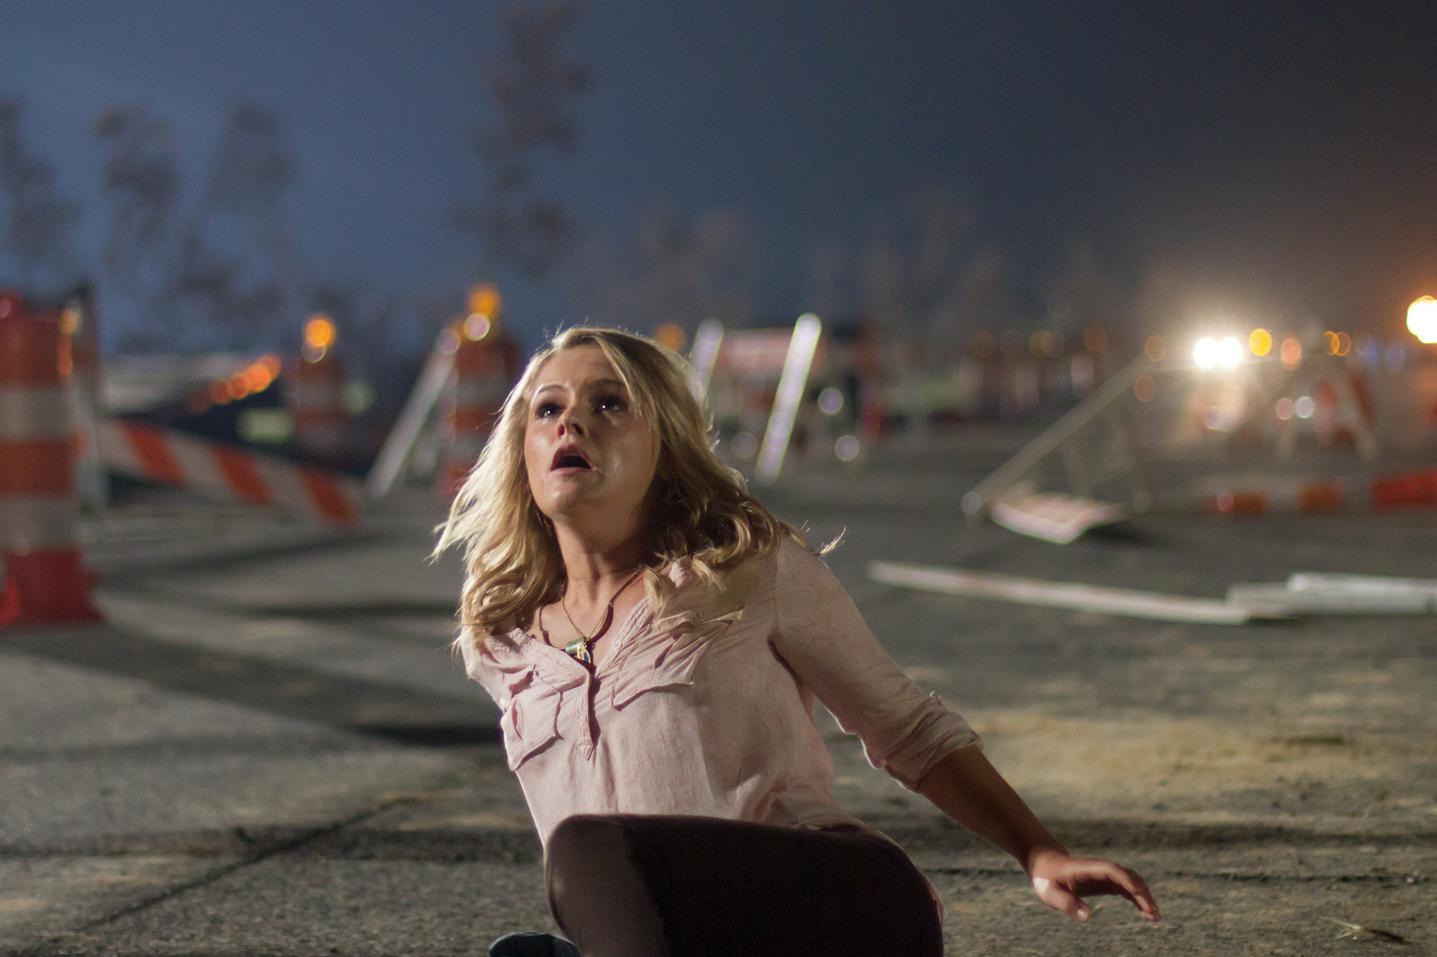 Left Behind - La profezia: Cassi Thomson in una scena del film